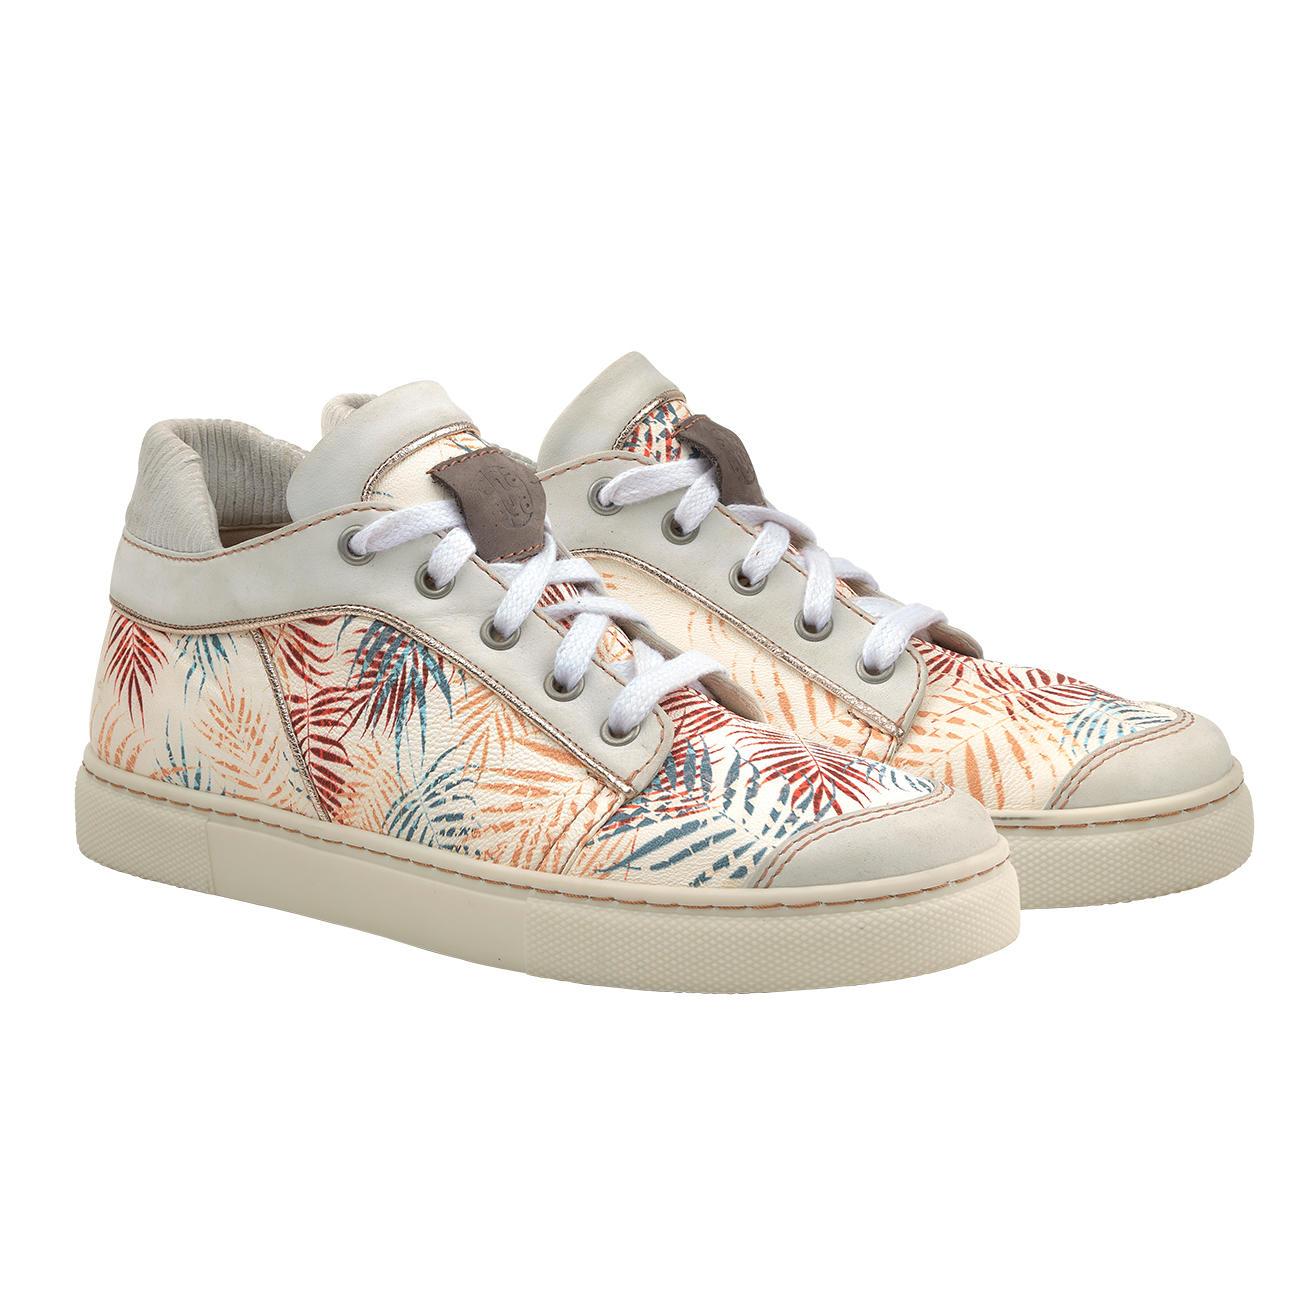 Chaaya Leder Sneaker Palmen Print | Klassiker entdecken